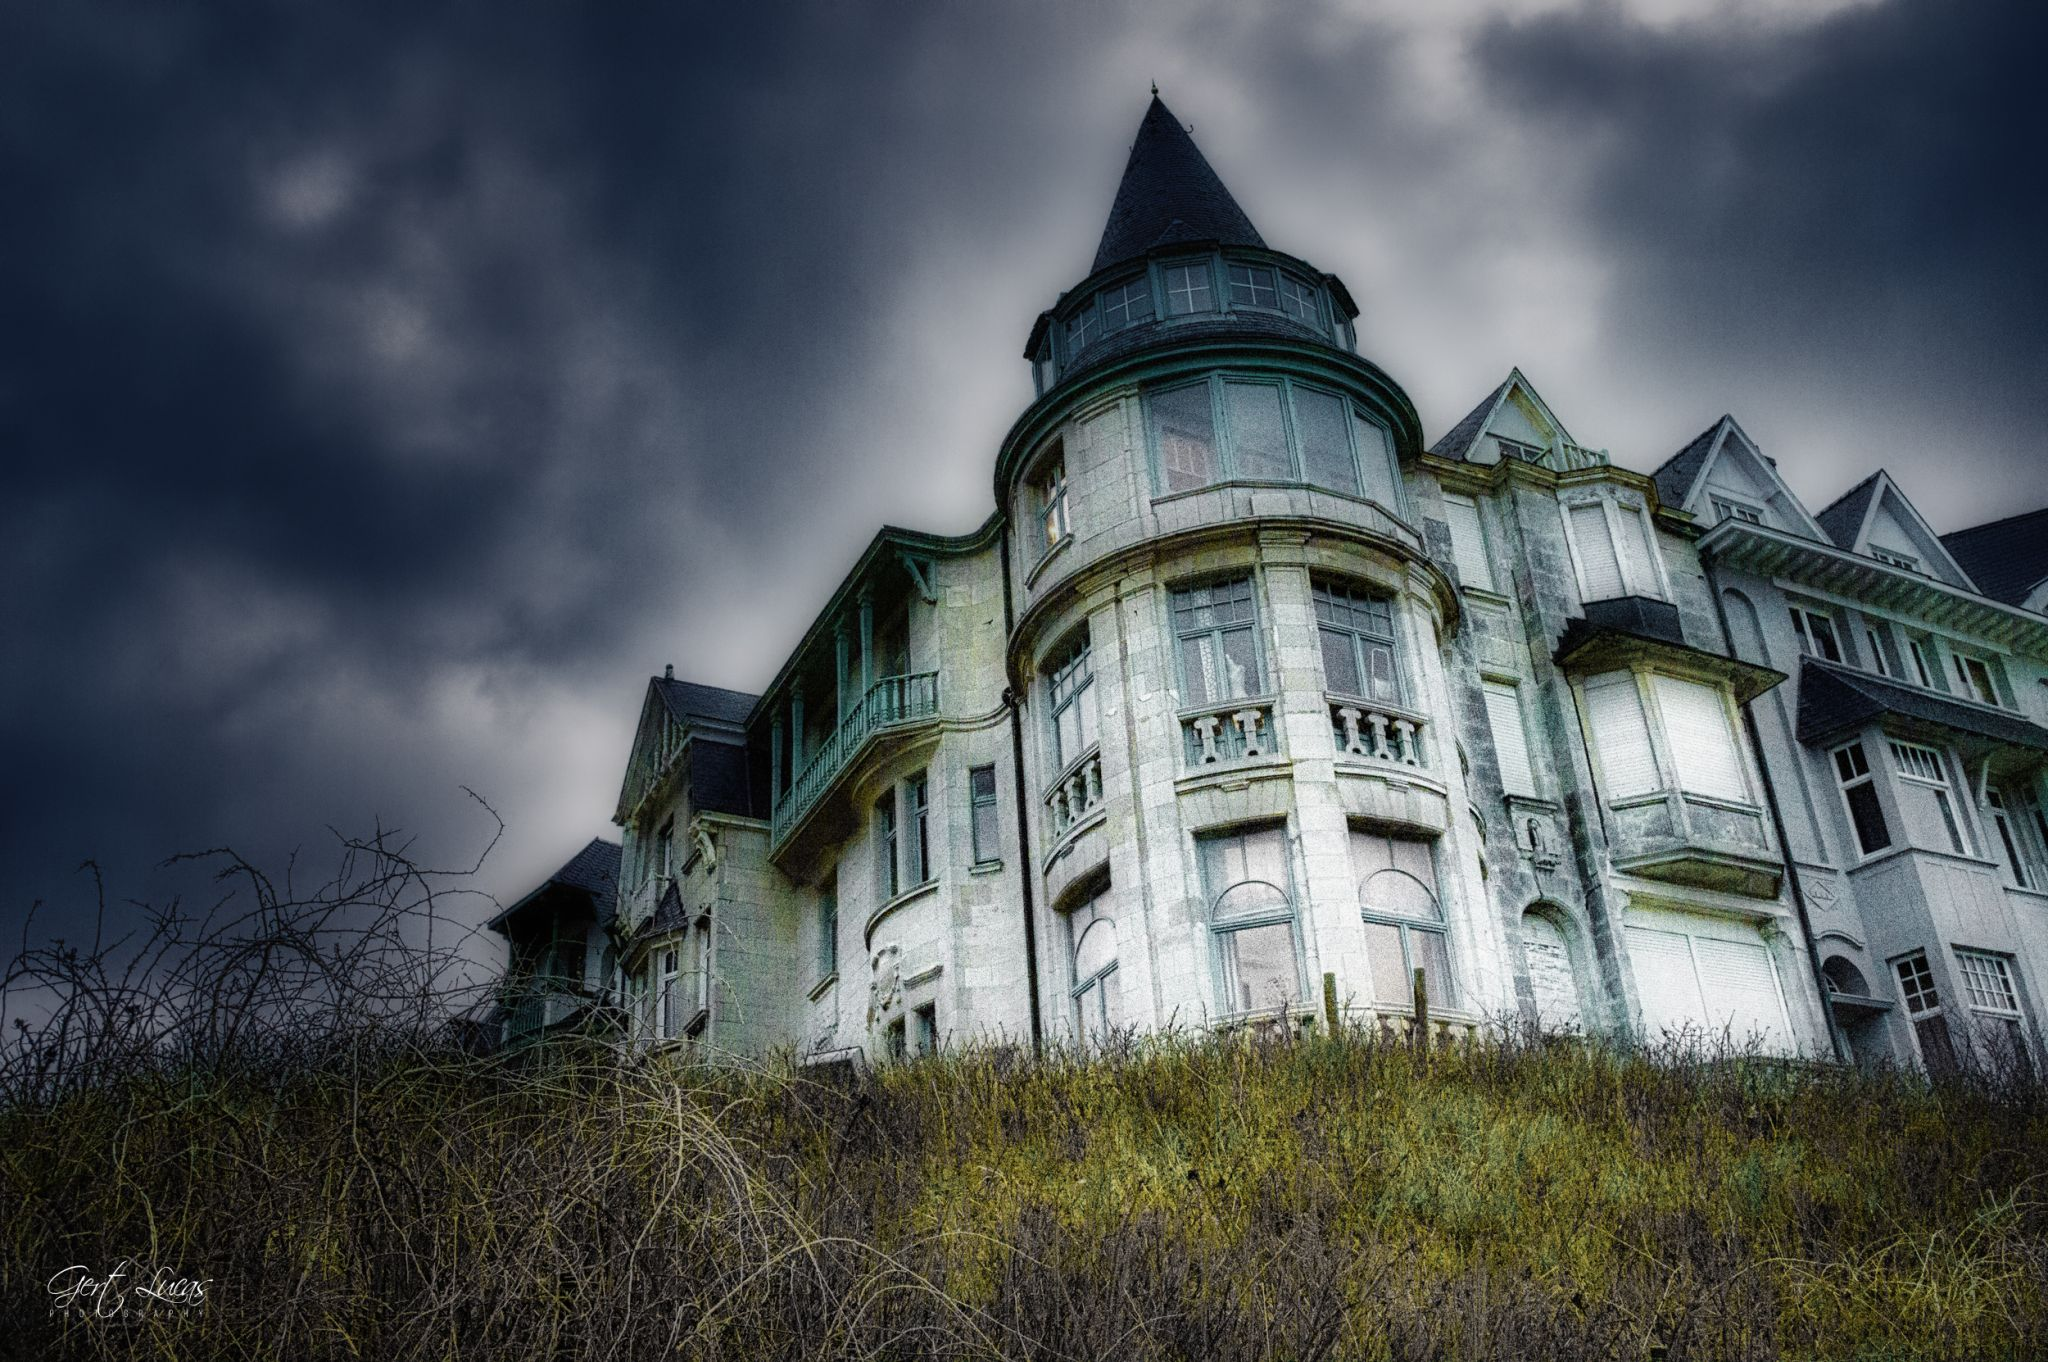 DePanne Haunted House, Belgium